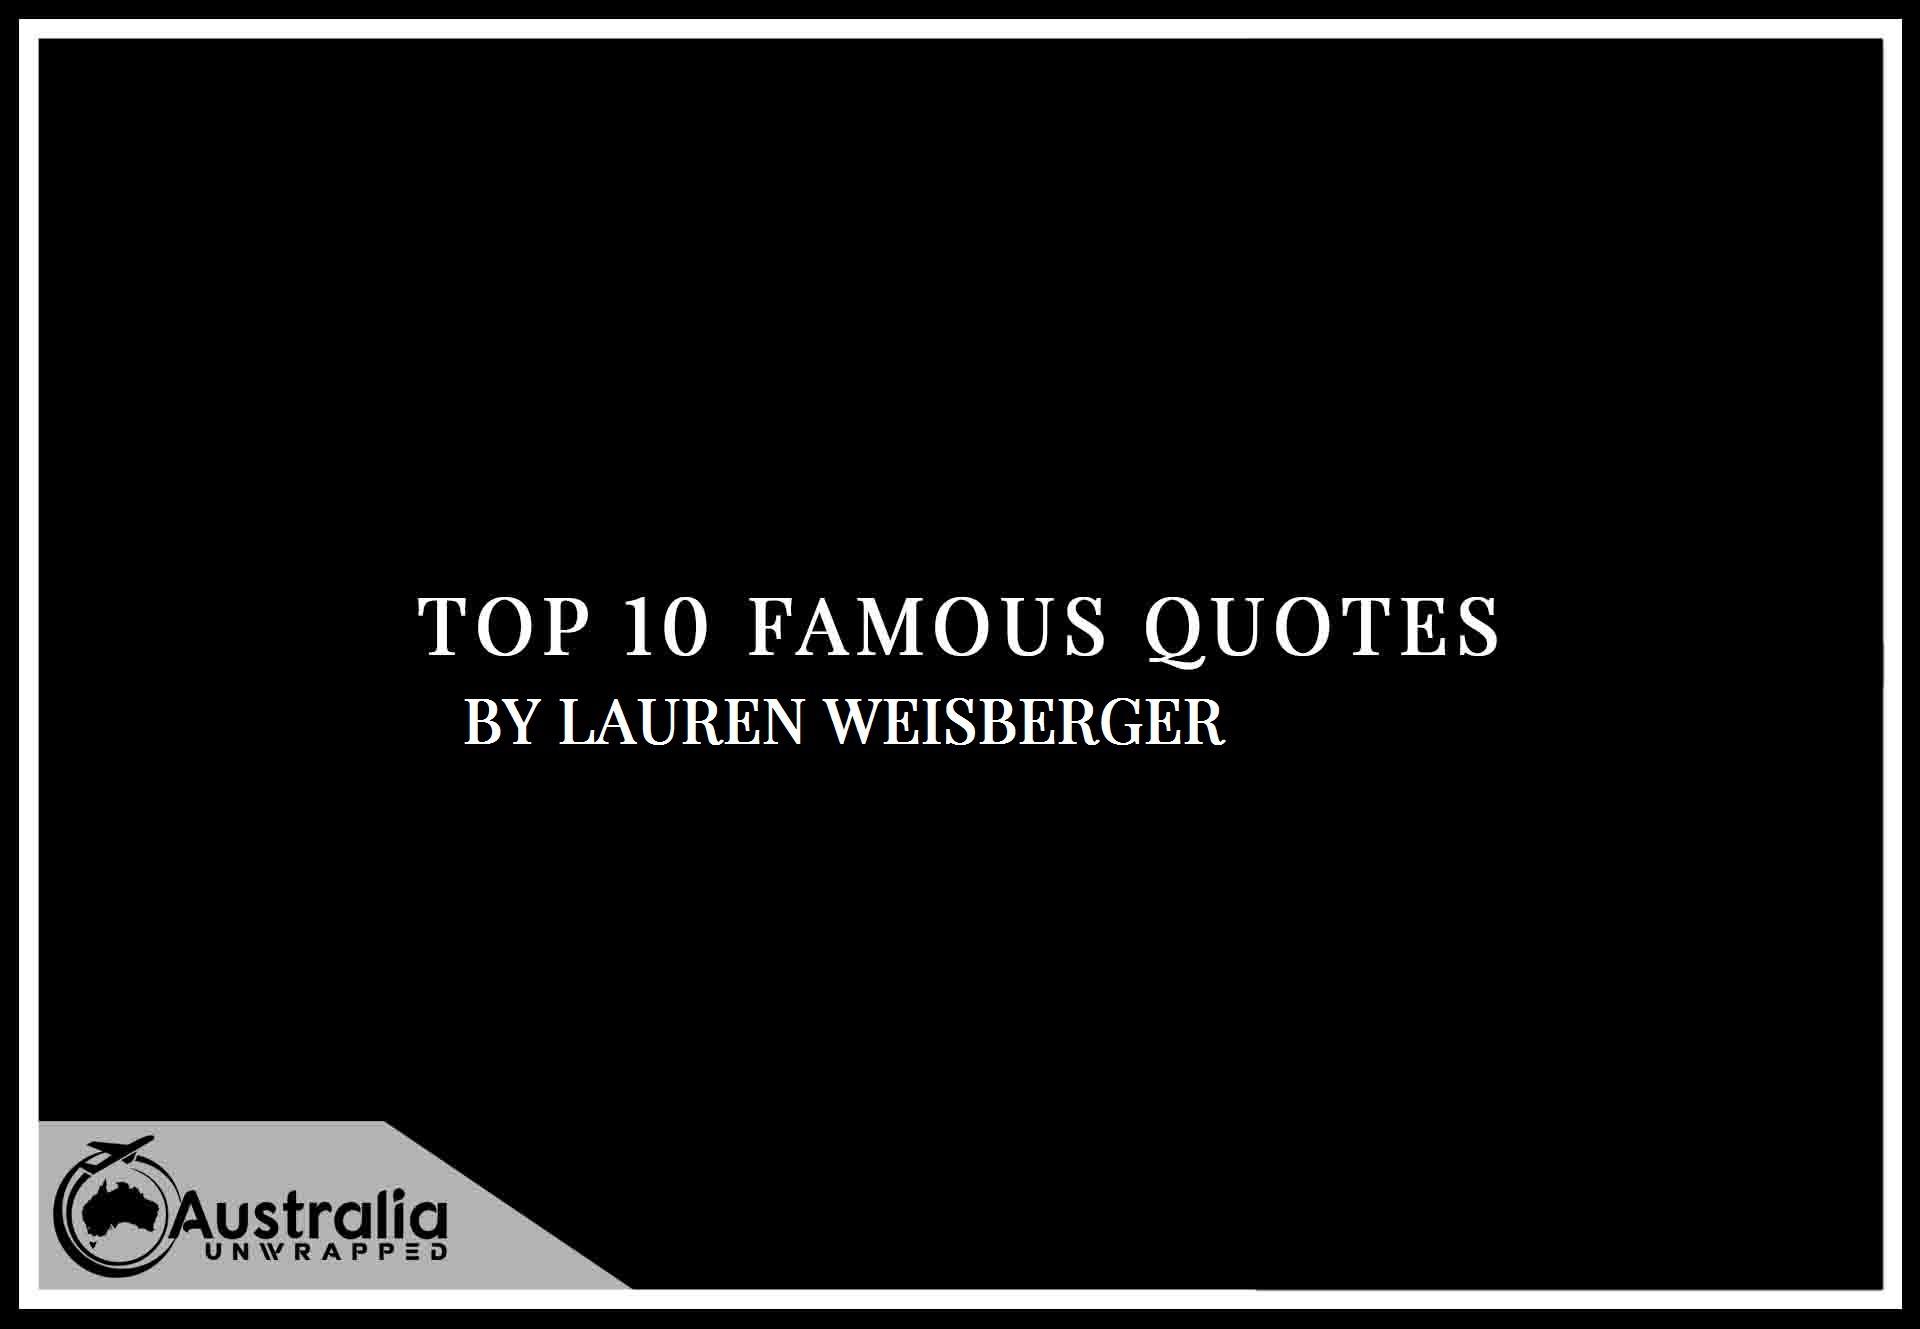 Lauren Weisberger's Top 10 Popular and Famous Quotes